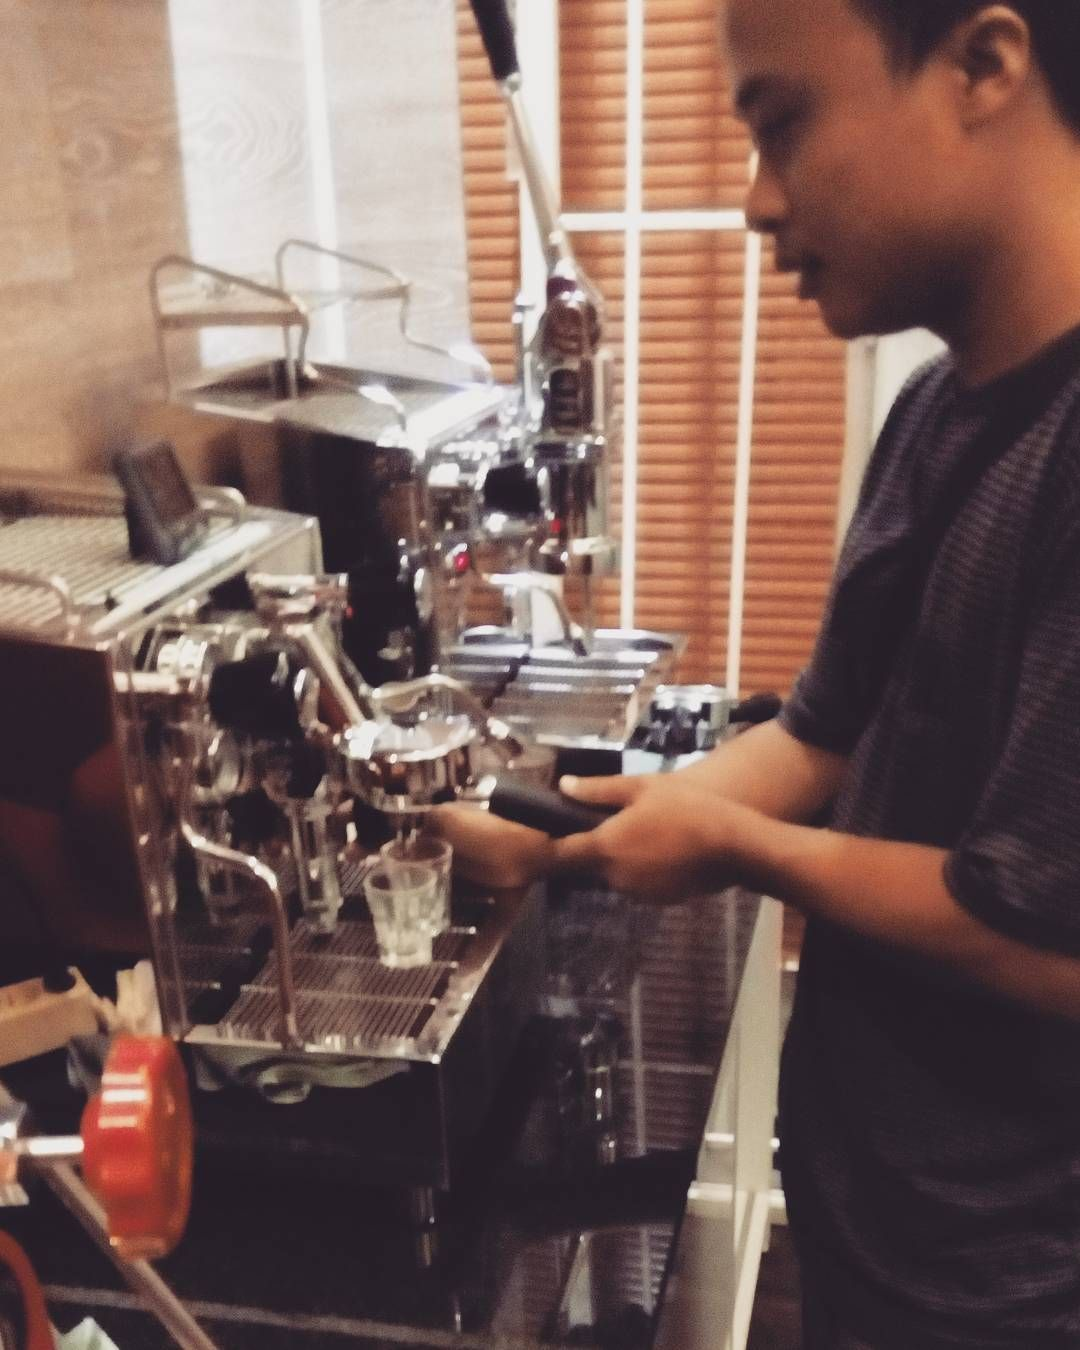 Jajal jualan mesin espresso... http://ift.tt/25bZ4Kr #fulcaff #espresso #barista #coffee #cappuccino #caffelatte #macchiato #flatwhite #americano #longblack #affogato #espressoconpanna #basicespresso #espressoshot #espressomachine #doubleboiler #espressotime #alexduetto #alexleva #mesinespresso #piston #lever #kursusbarista #baristaart #baristacourse #baristatraining #fulcaffeverywhere #fulcaffcoffee #fulcaffcafe www.fulcaff.coffee http://ift.tt/1VbgBi2